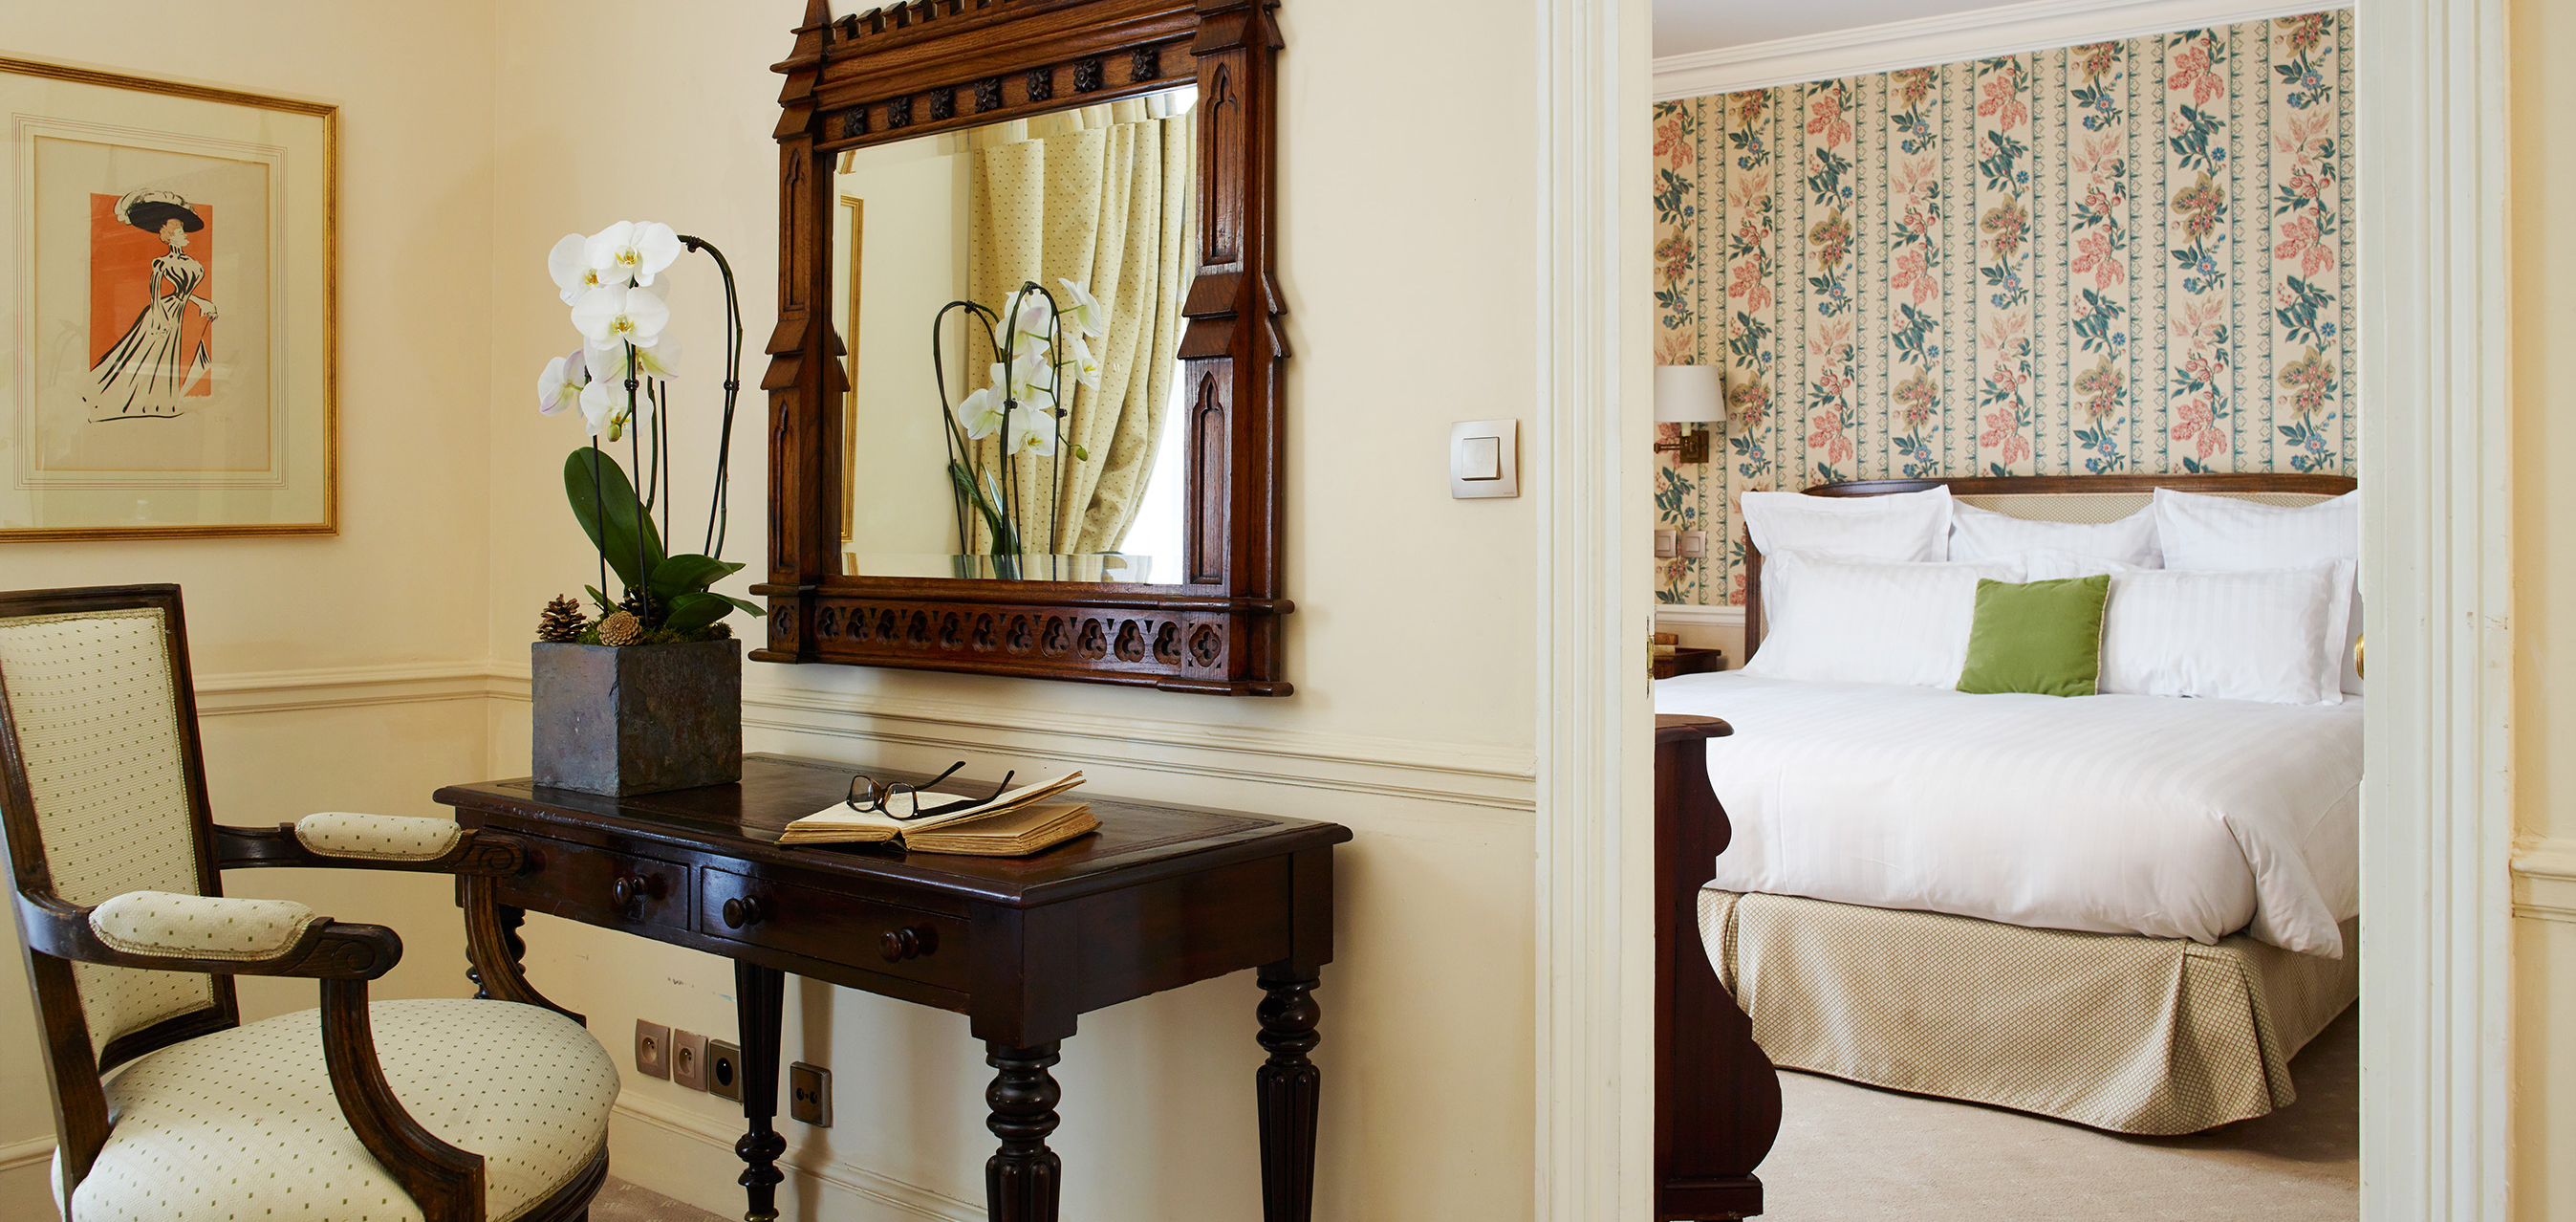 Hotel De Vigny Luxury Paris Hotel Offers